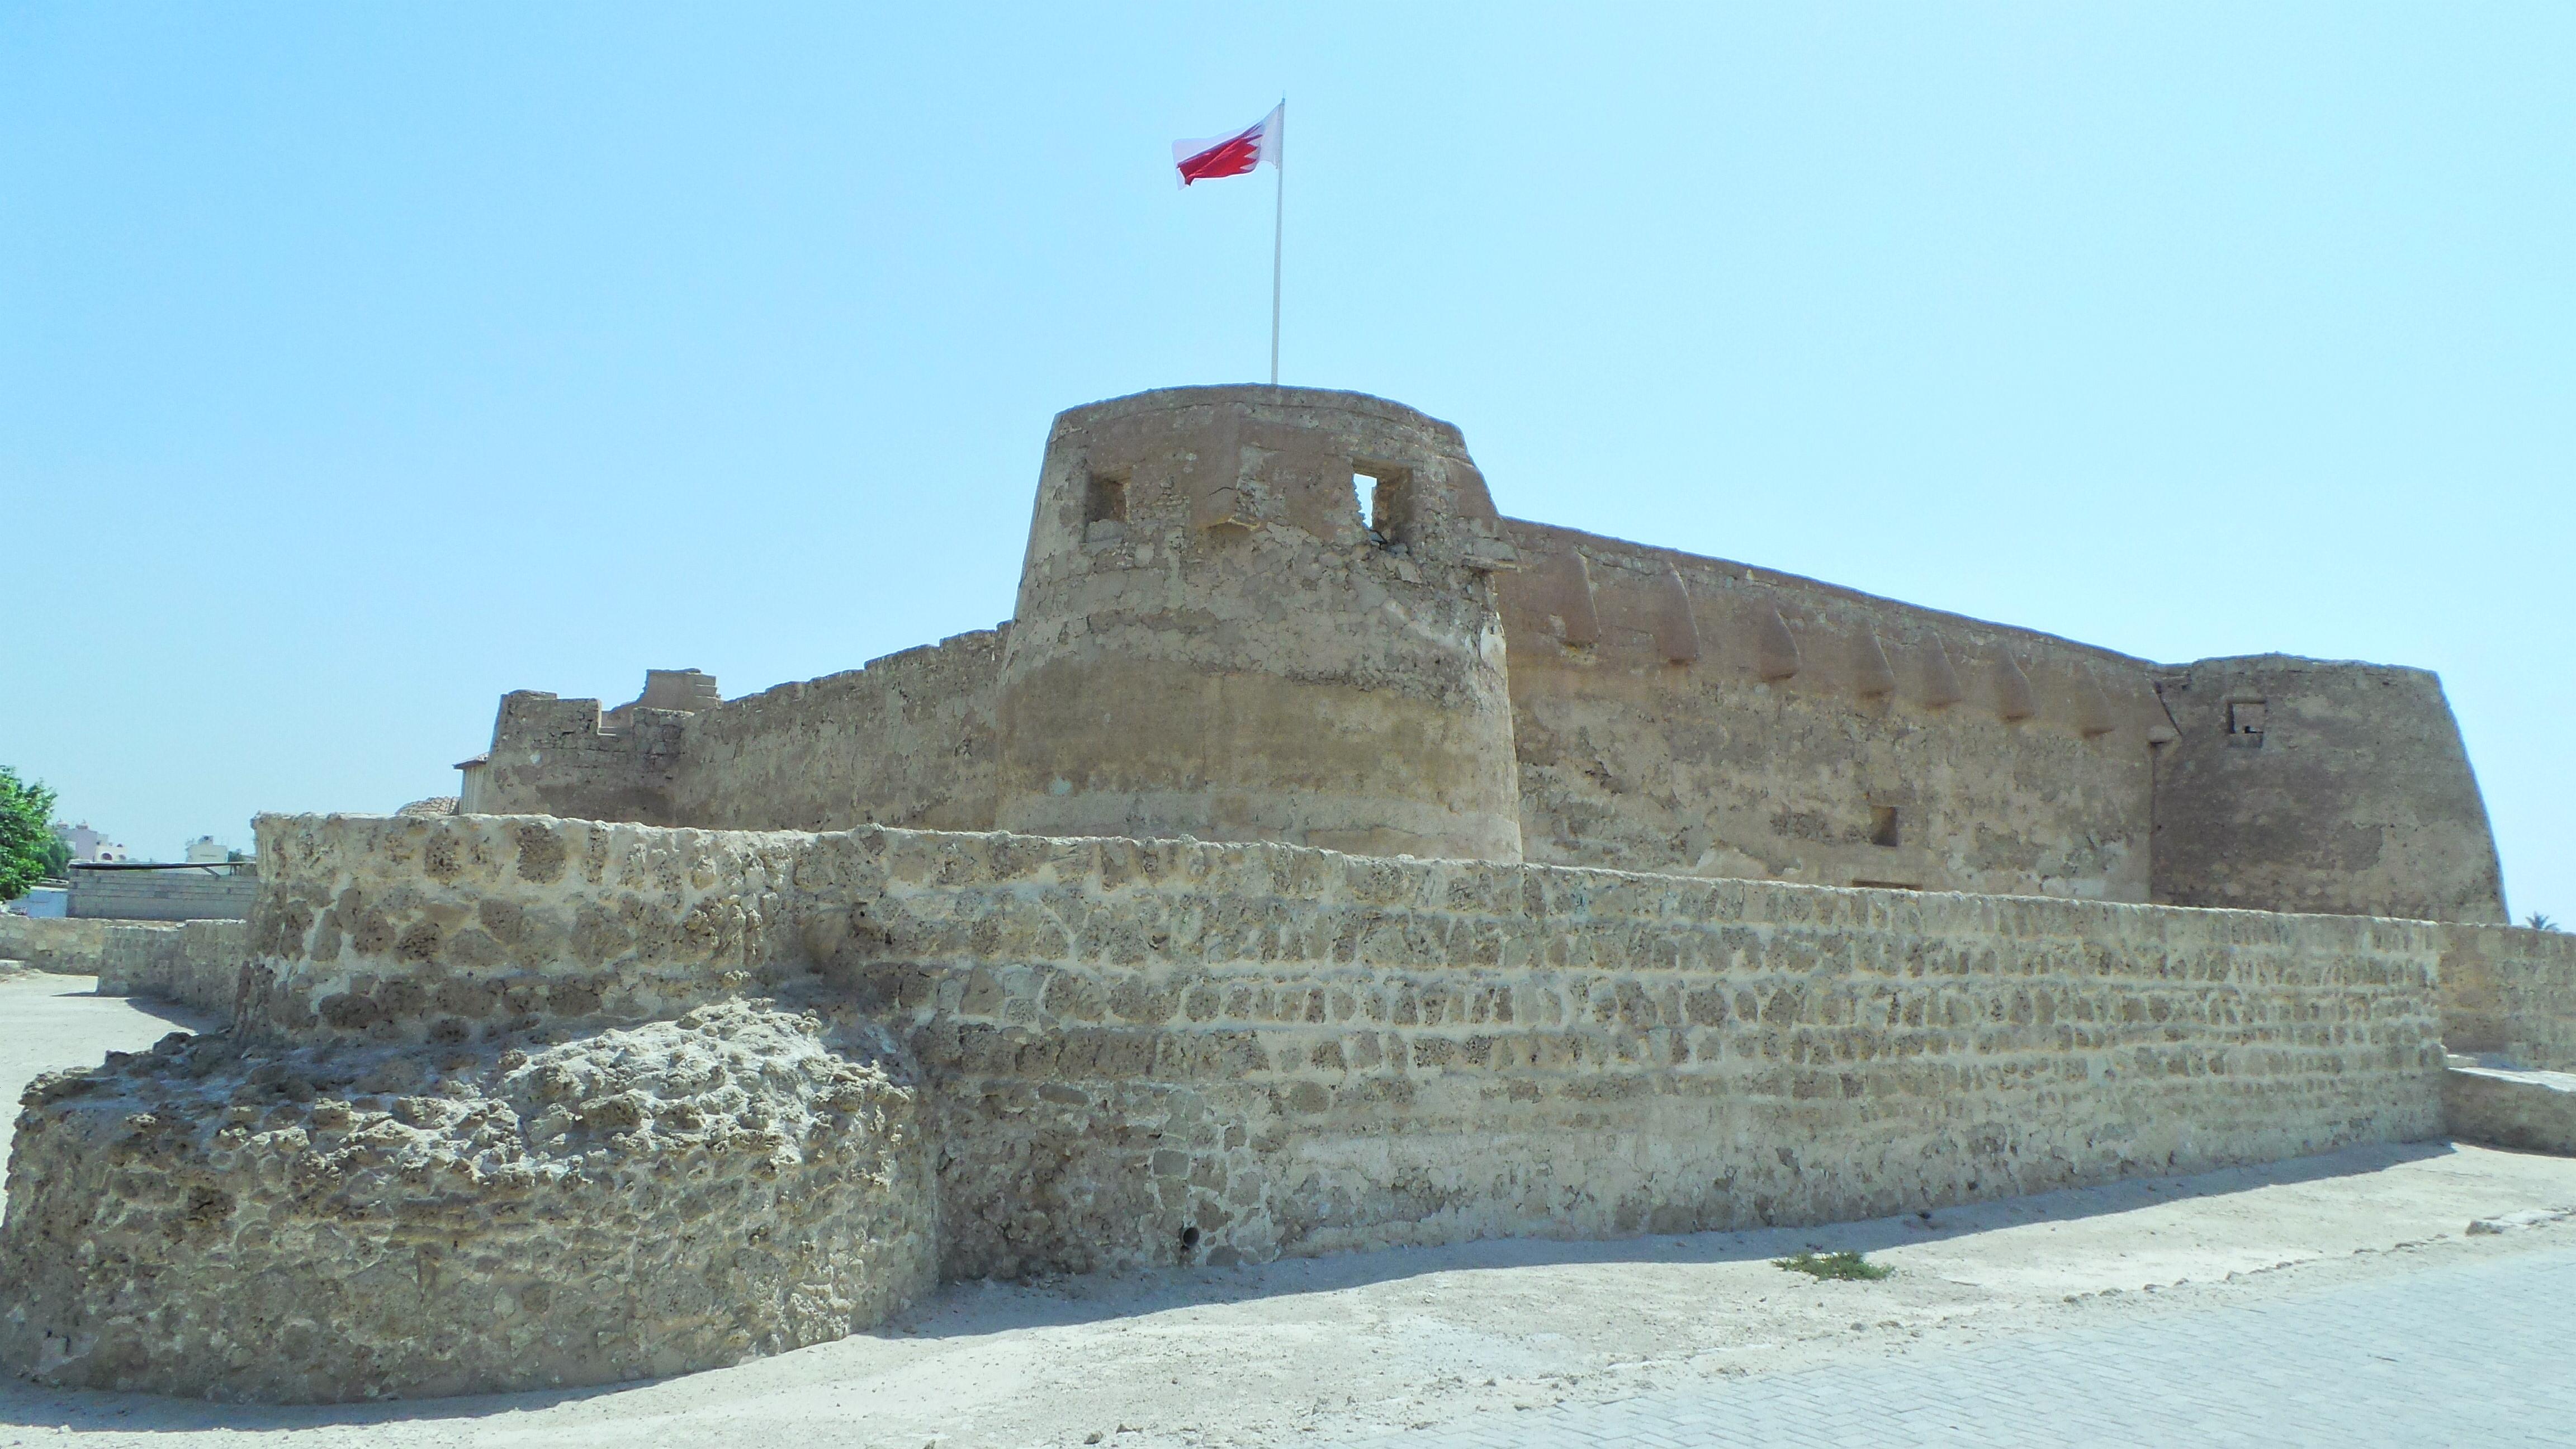 Arad Fort Muharraq Bahrain